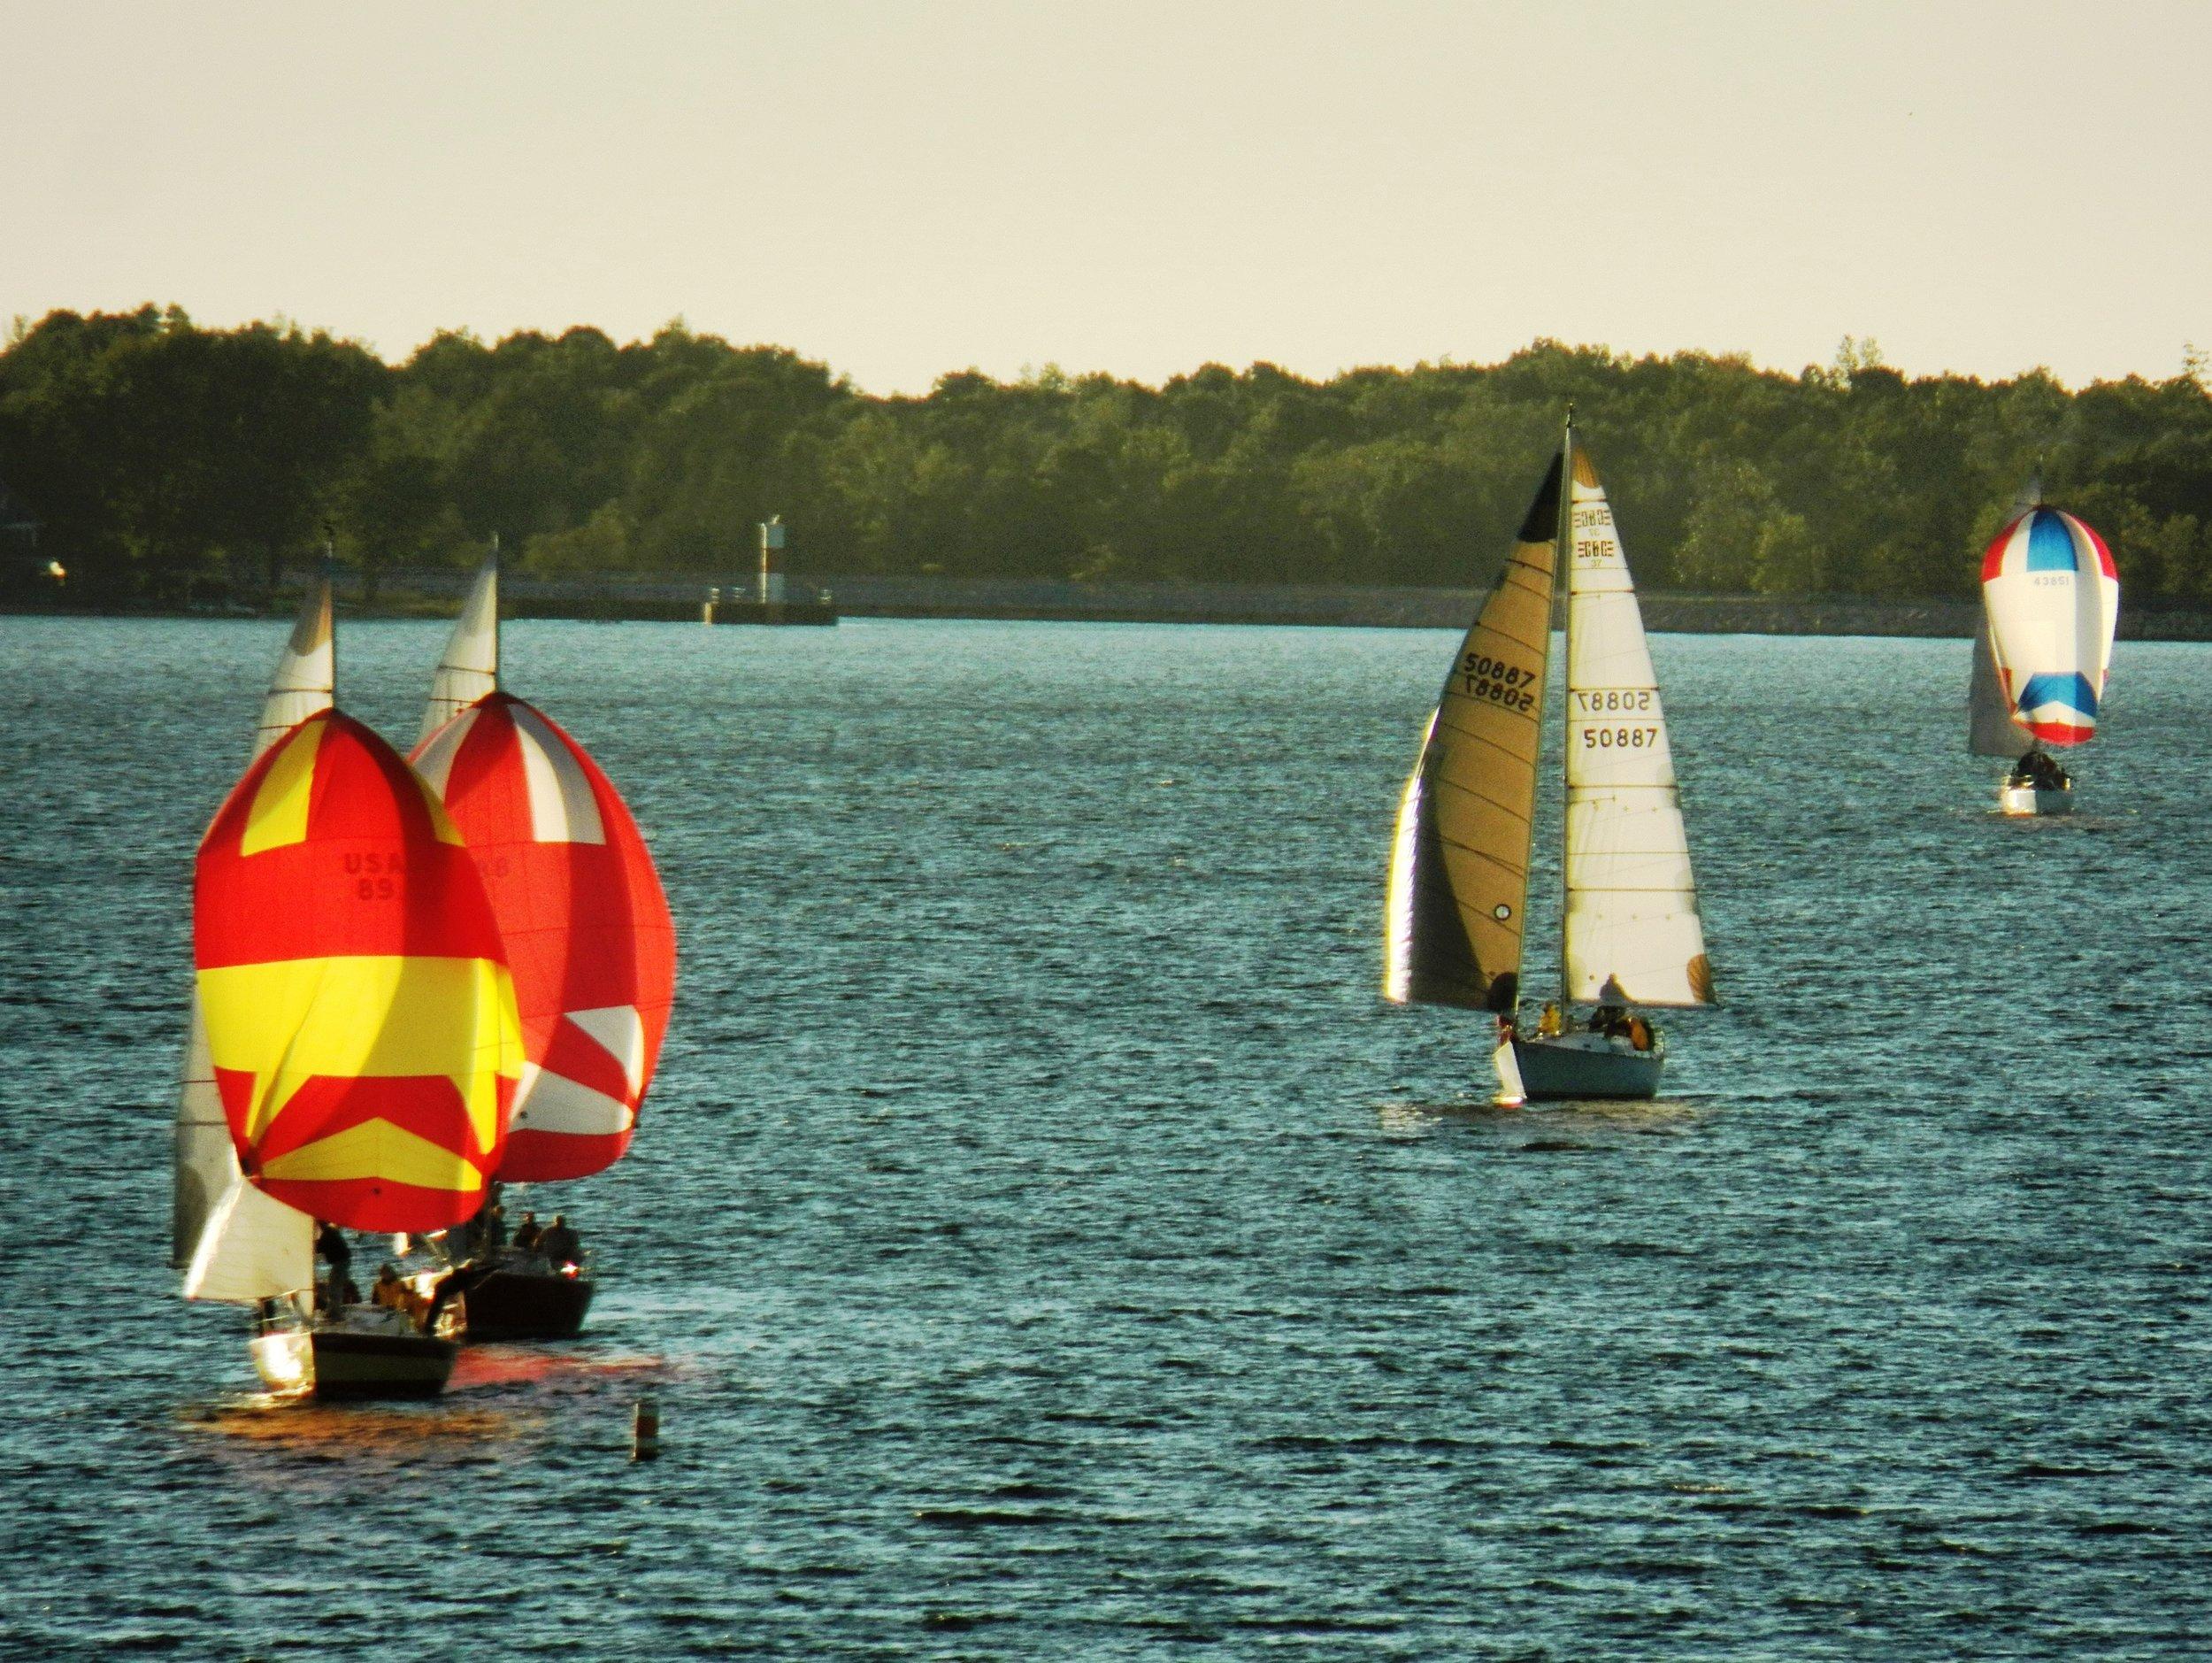 Boats on Muskegon Lake